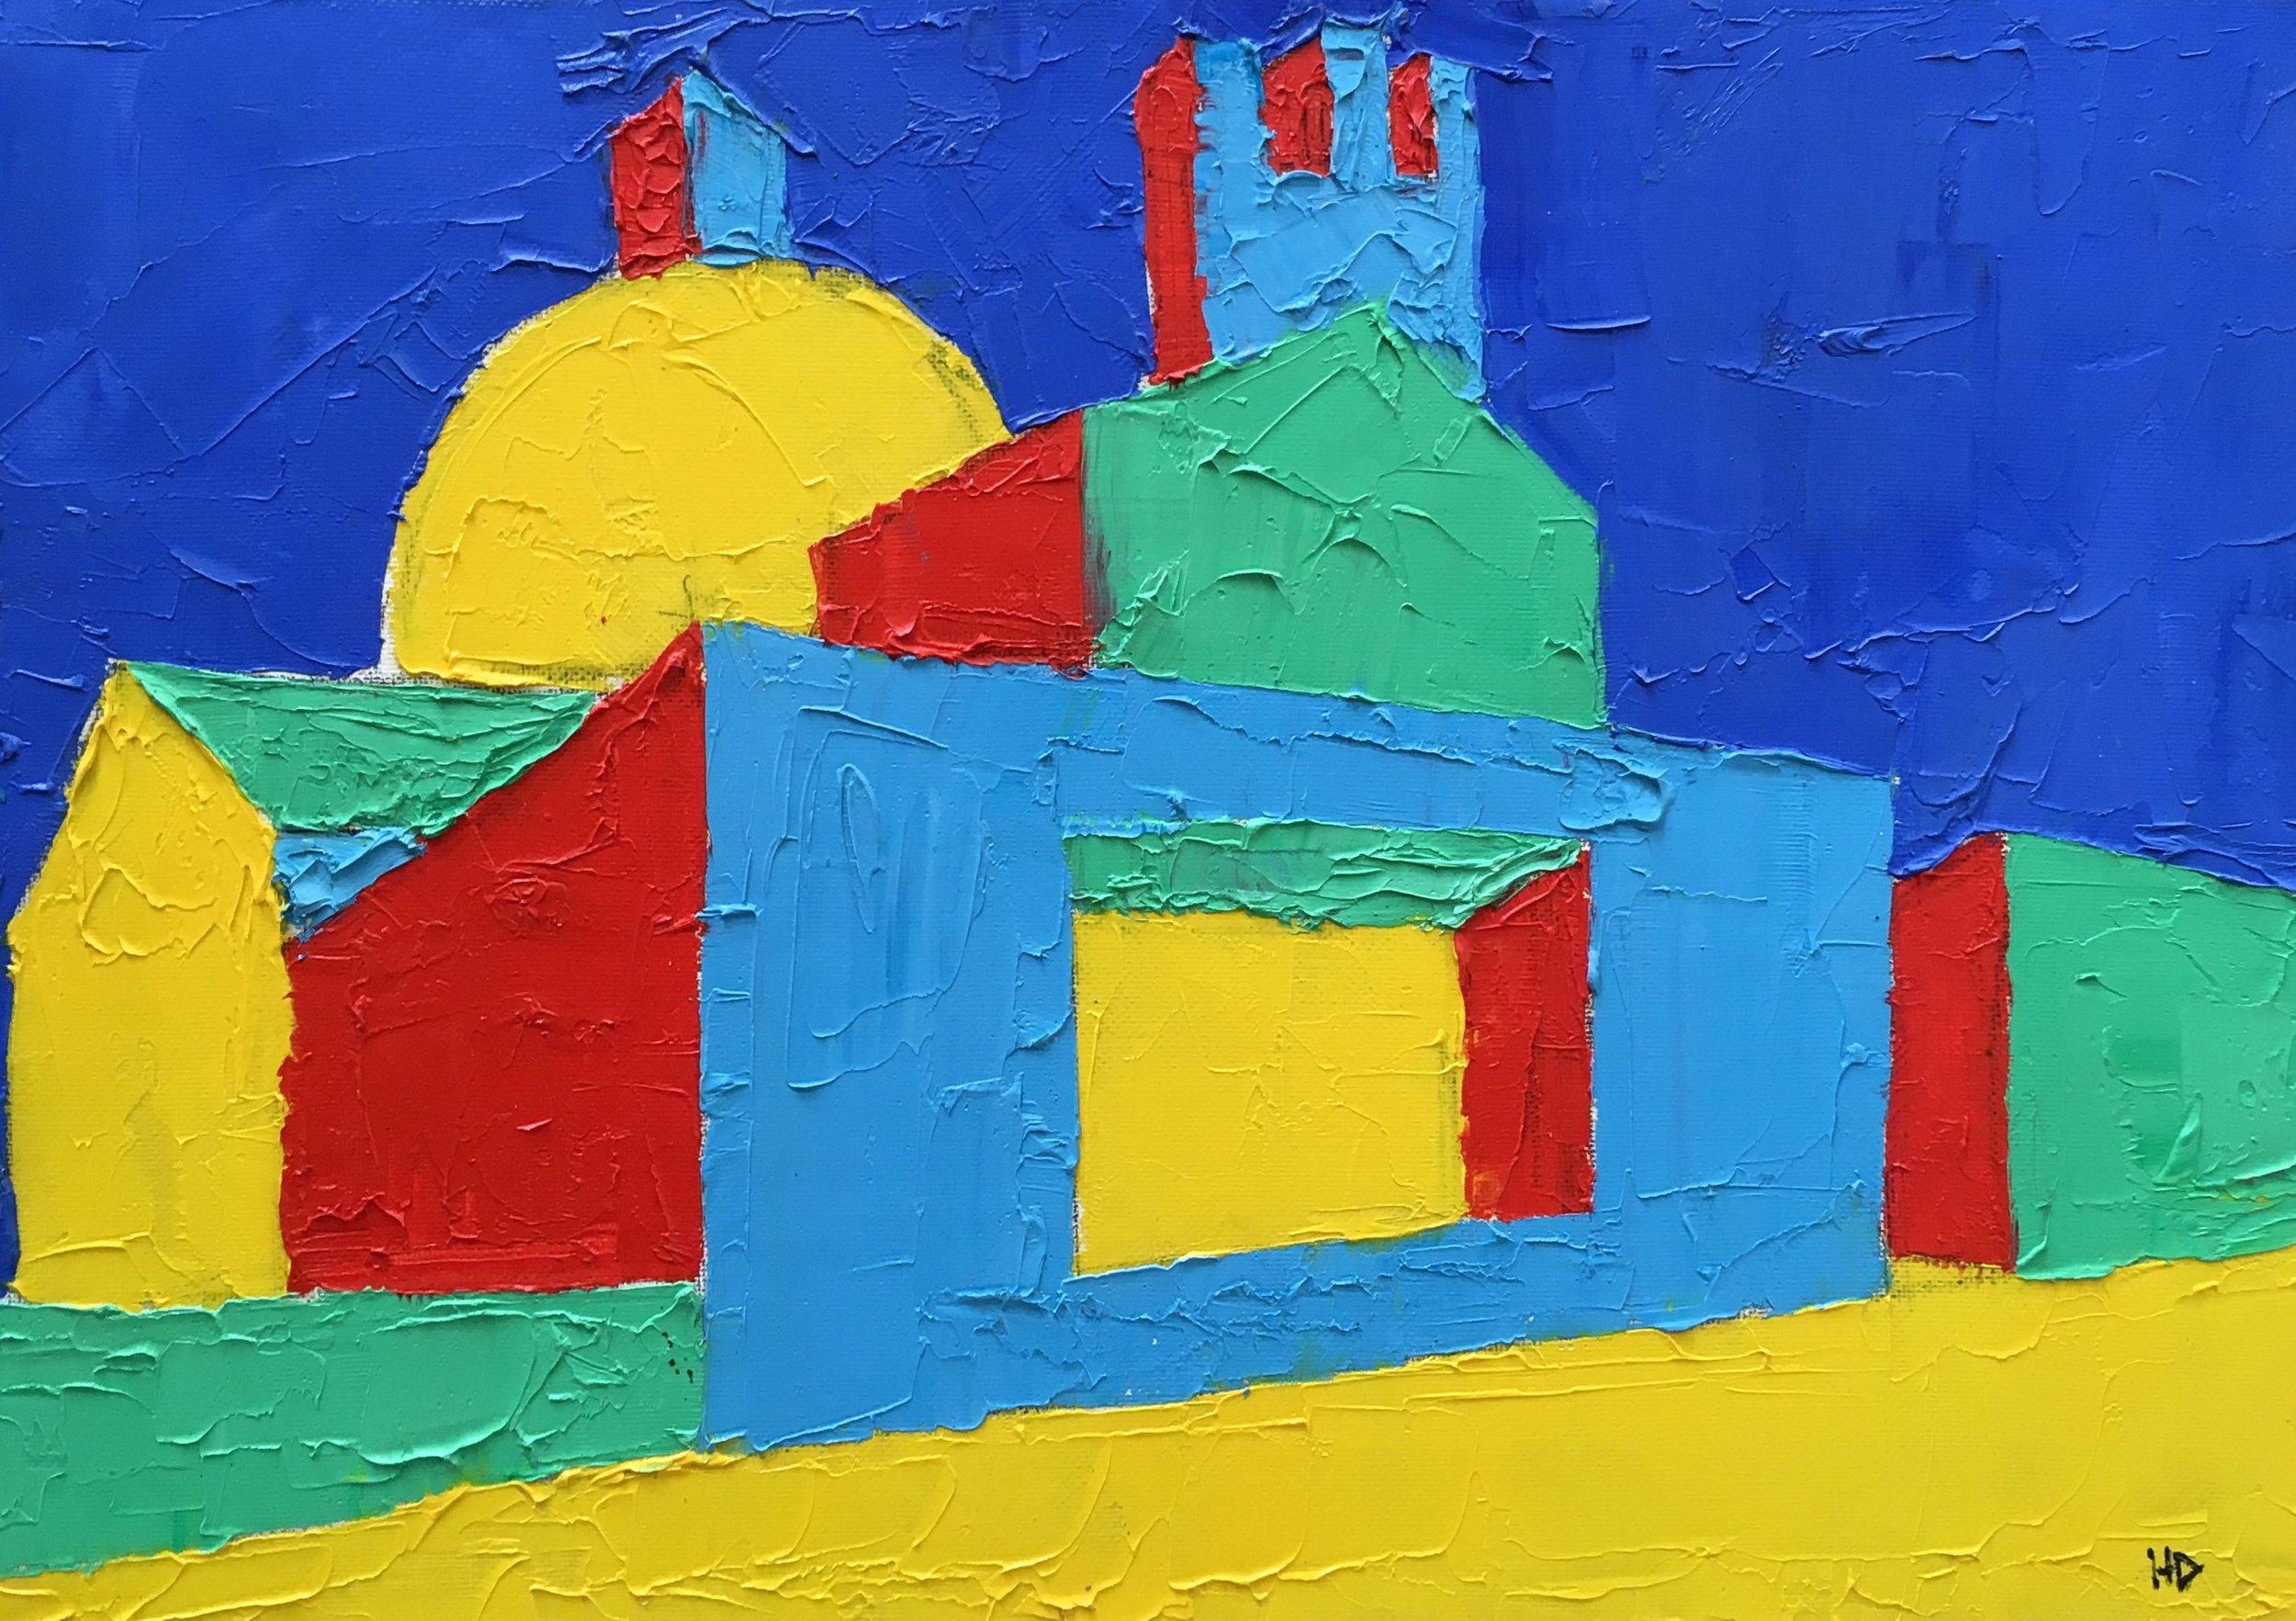 Brompton Oratory knightsbridge  oil on canvas  £600  30 by 40 by 1.5 cm  unframed